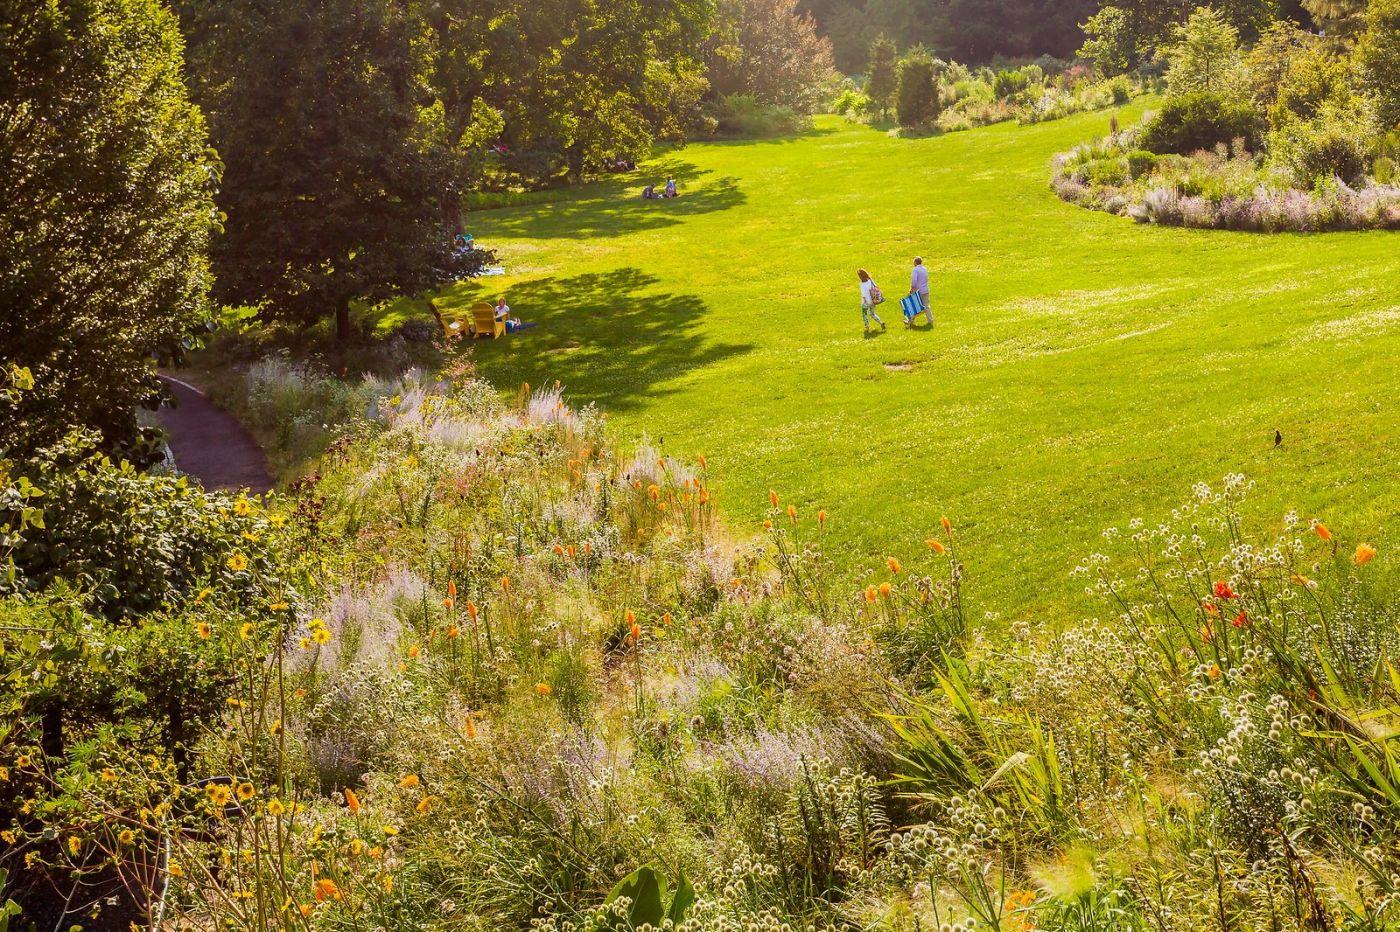 Chanticleer花园,季季有色彩_图1-10